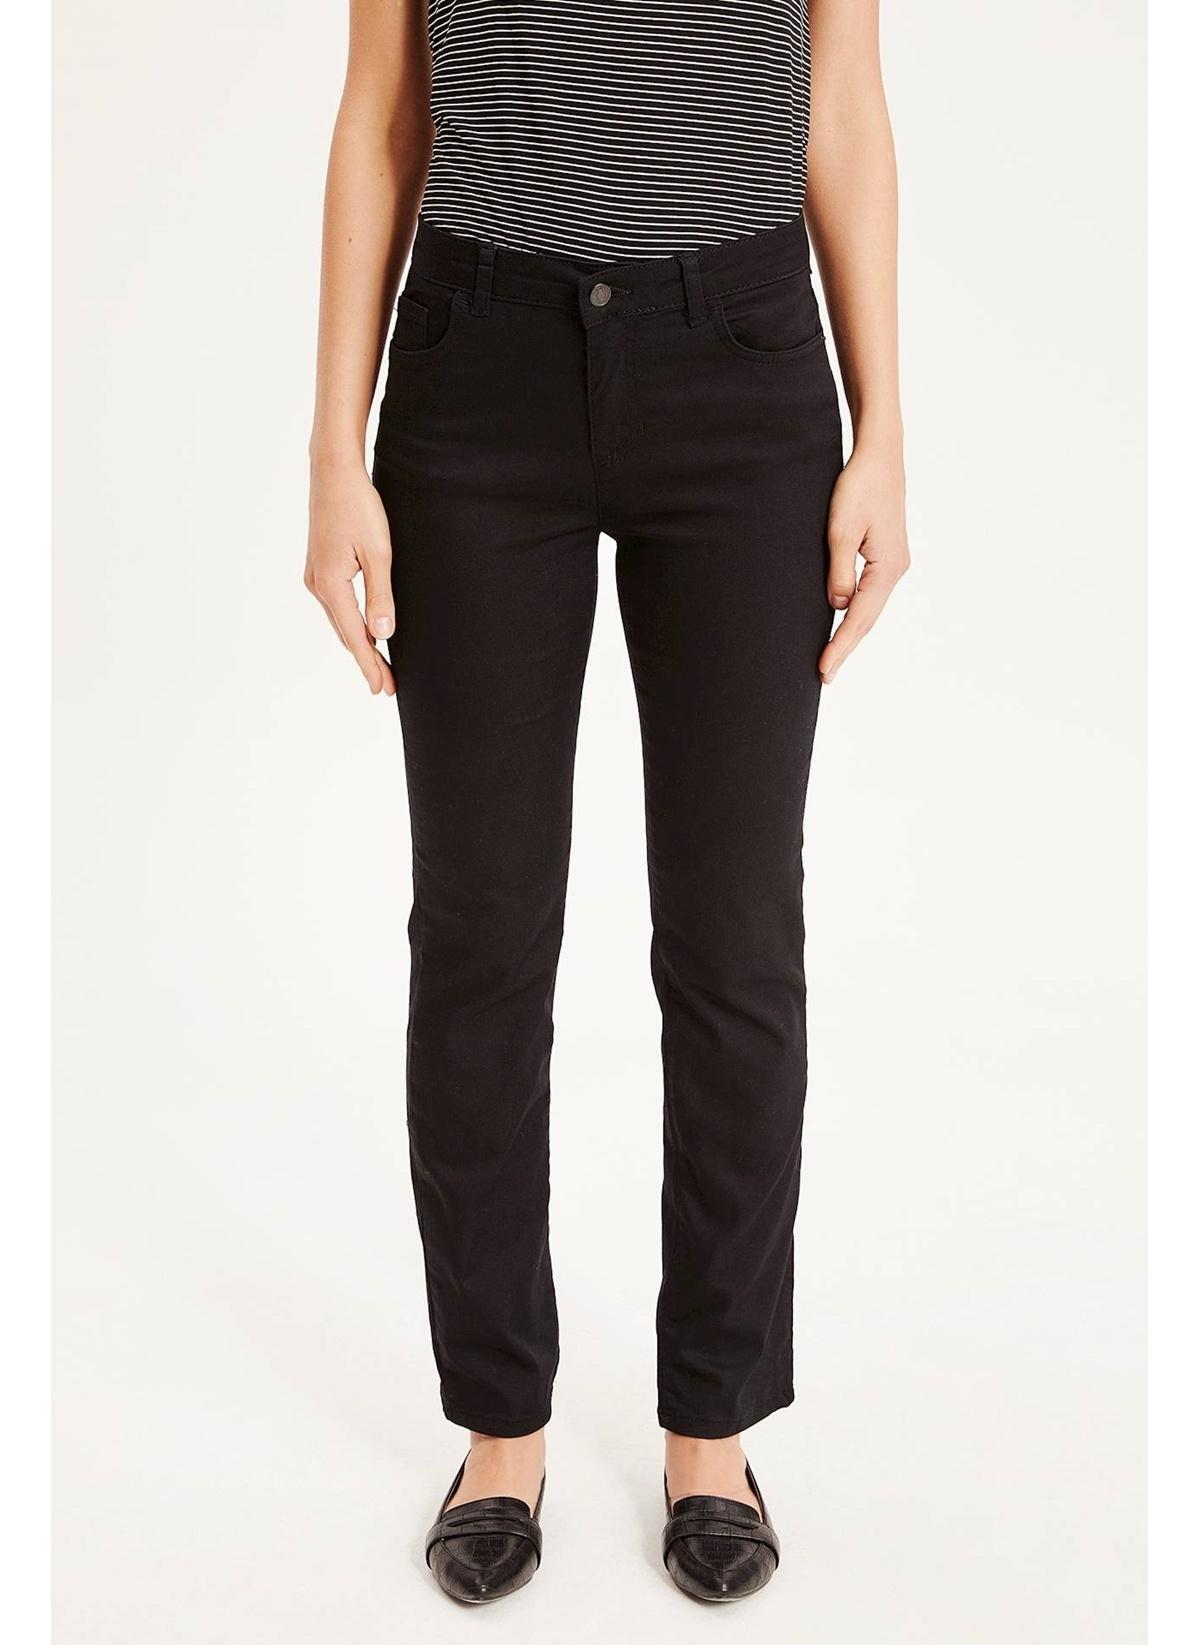 Defacto Carmela Straight Fit Pantolon J8754az19spbk27pantolon – 49.99 TL